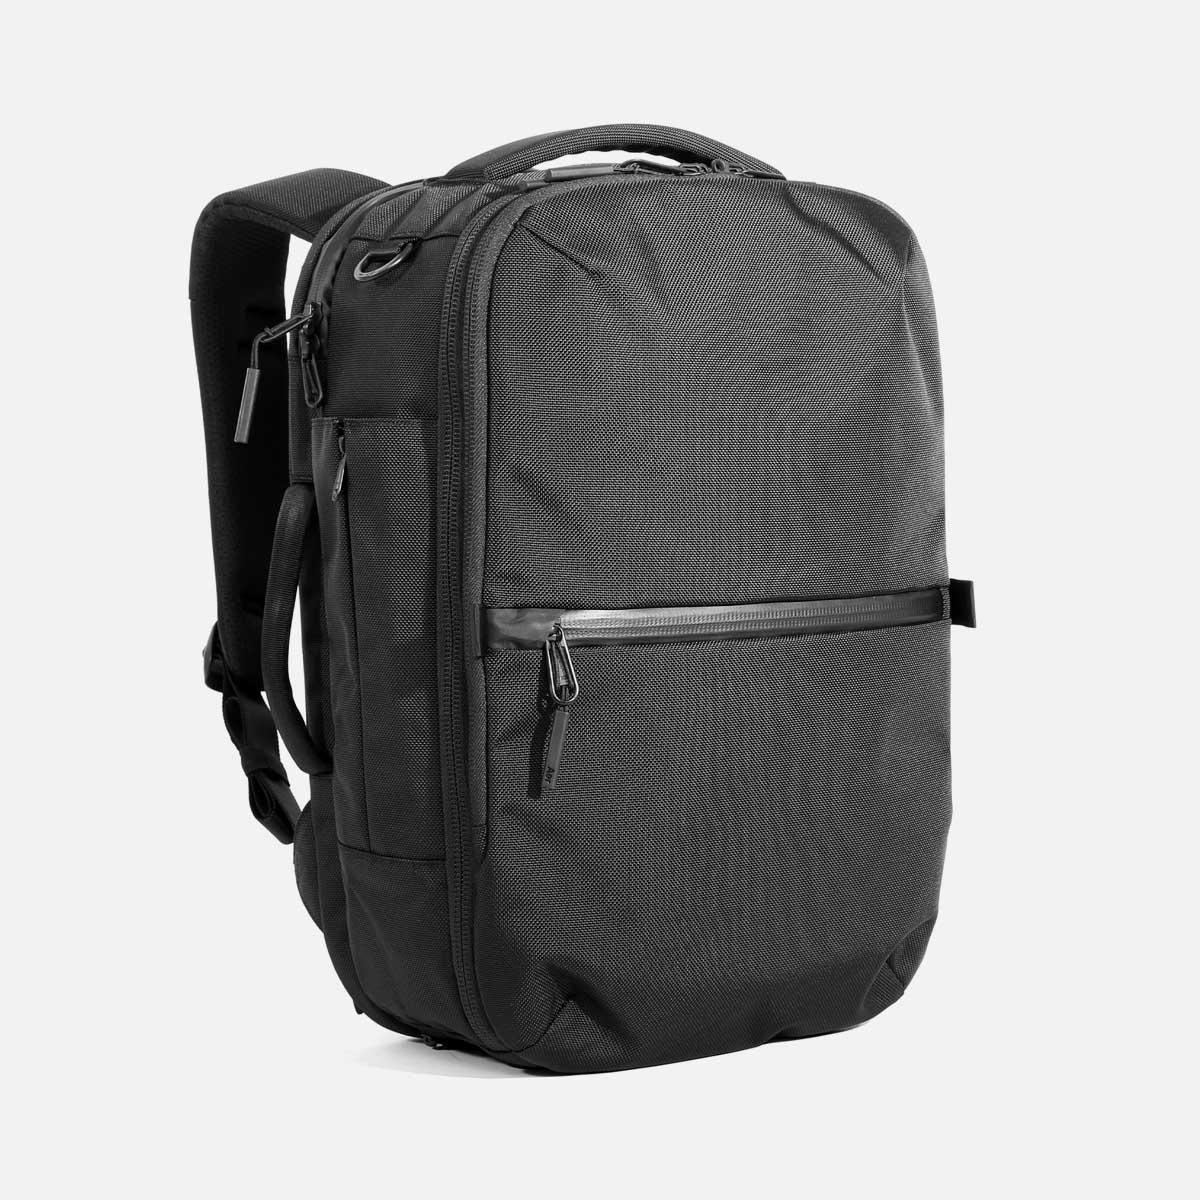 AER21022_travelpack2small_34hero.jpg